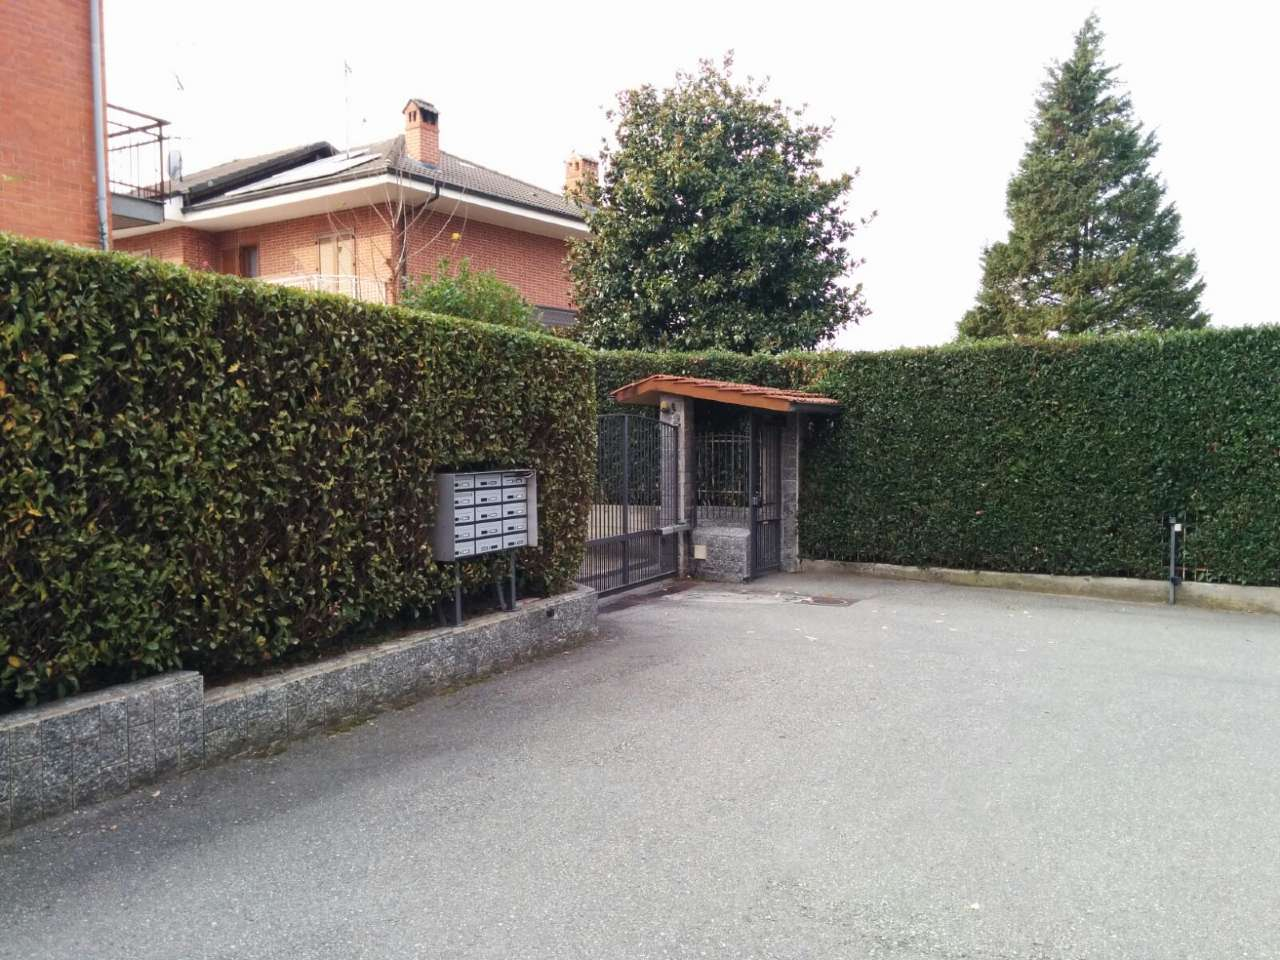 Appartamento in vendita strada Bucet 42 Rosta